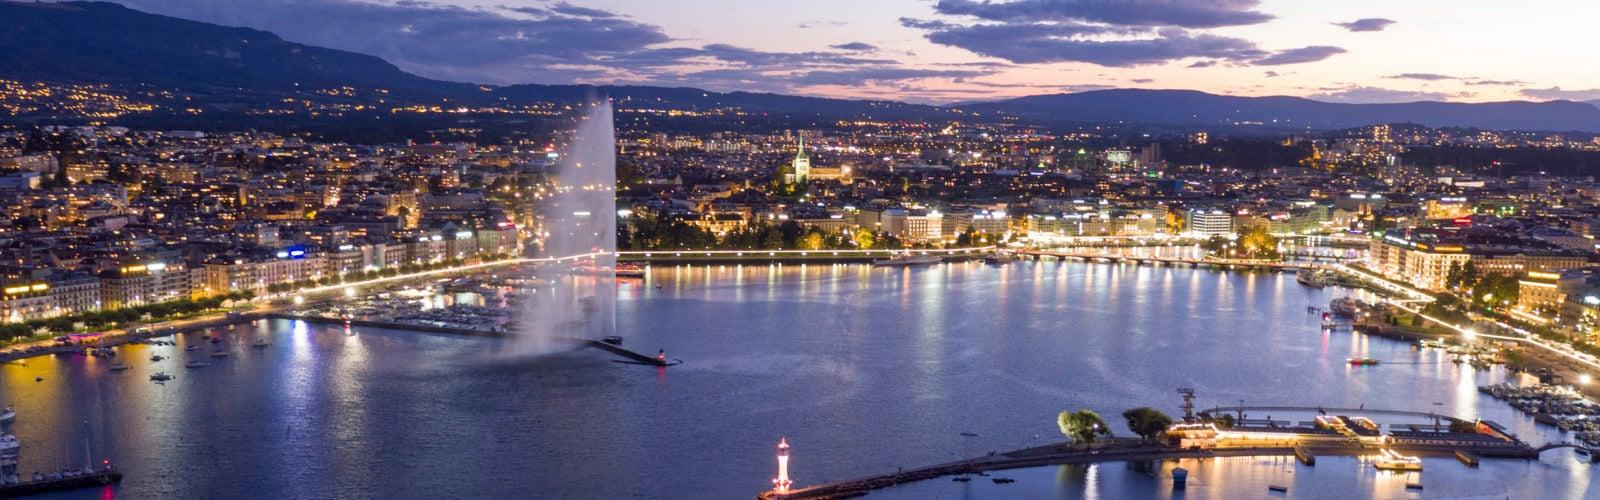 lake-geneva-night